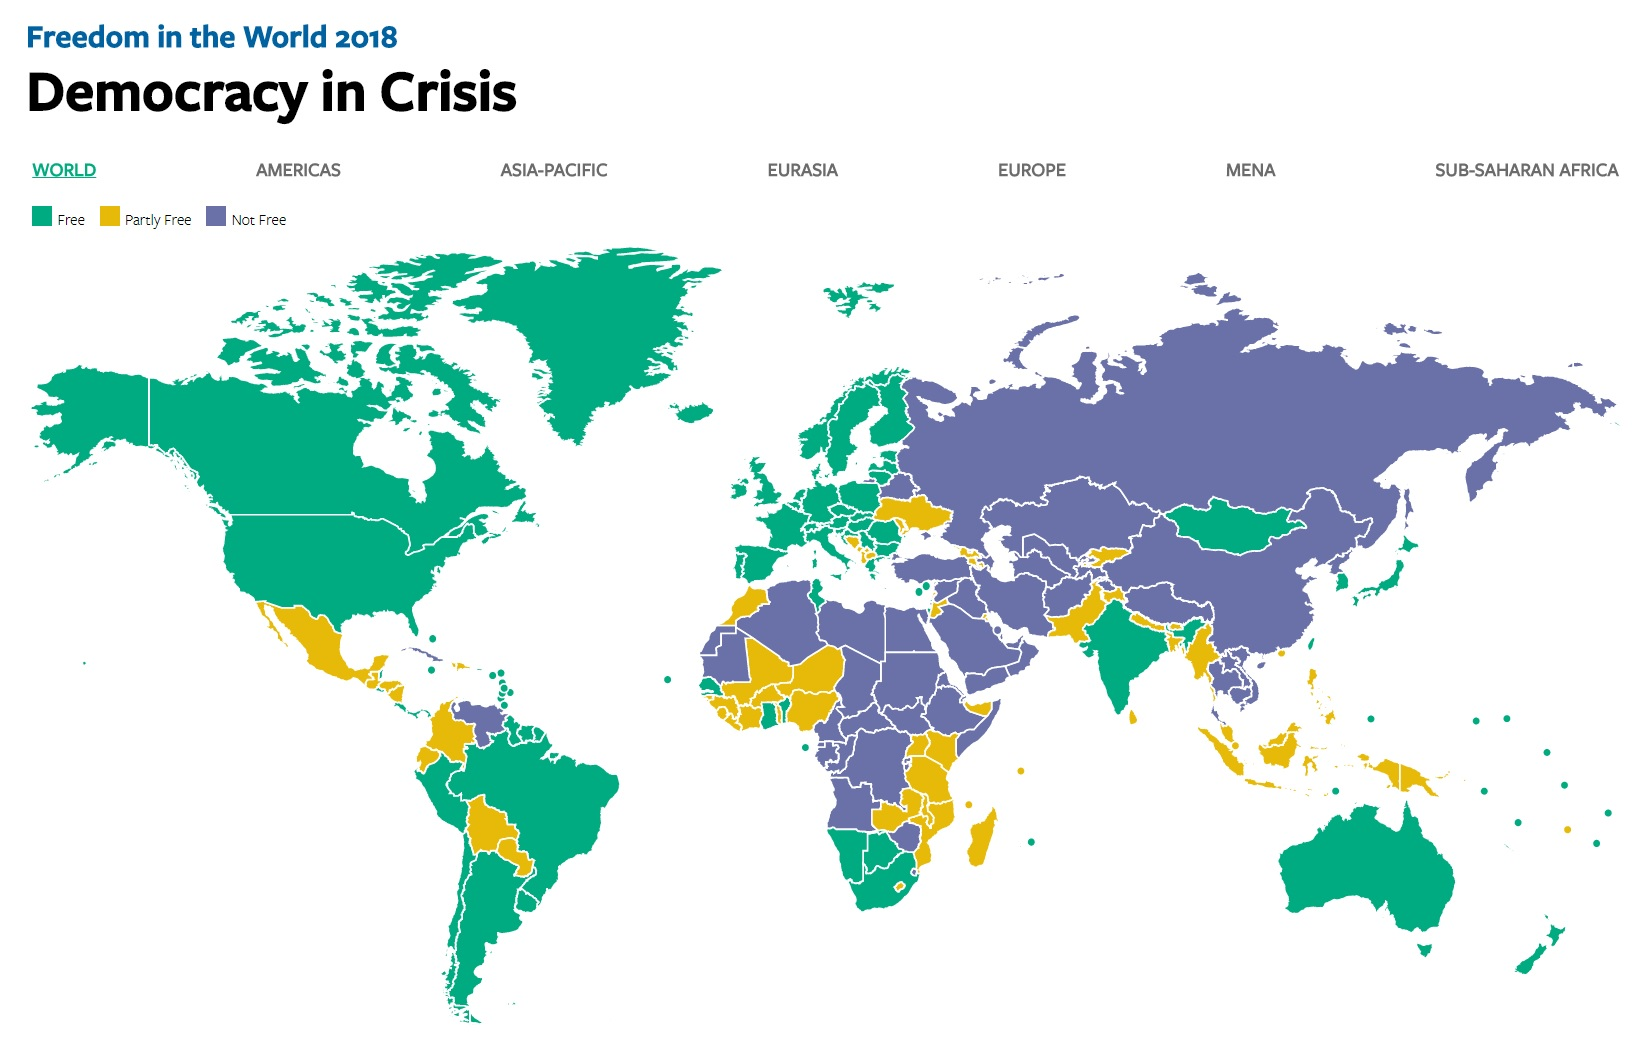 Freedom House #новости Freedom House, Азербайджан, Армения, Афган Мухтарлы, Грузия, Мухтарлы, Россия, свобода, Турция, украина